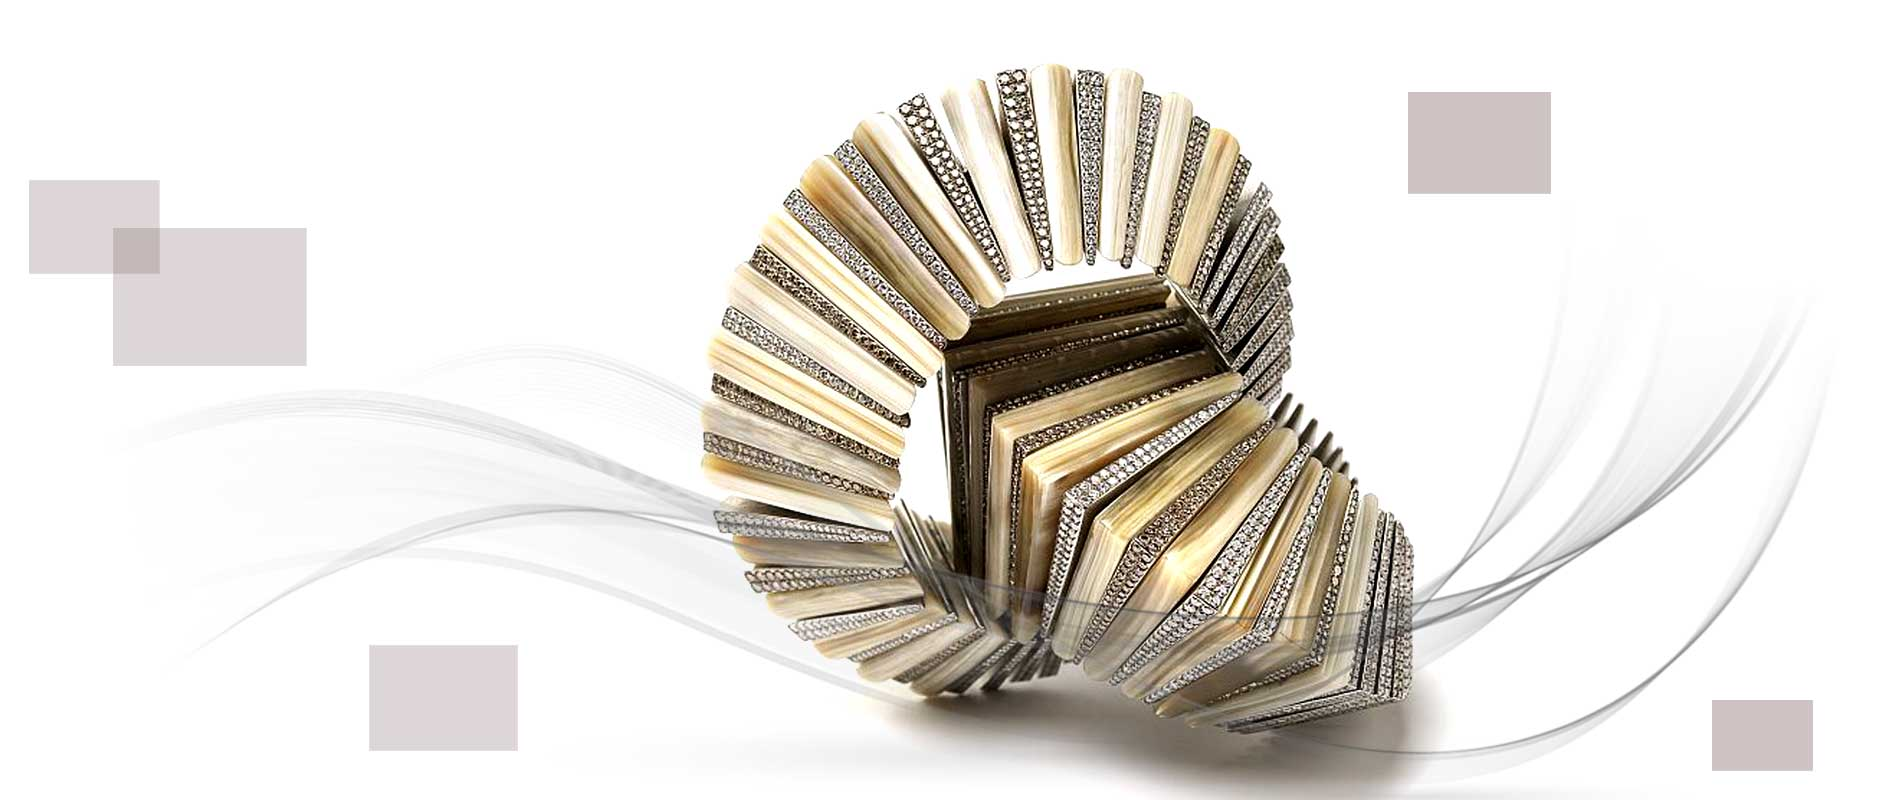 Jewellery designers 09 1 - استفاده از مواد اولیه غیر متعارف در جواهر سازی